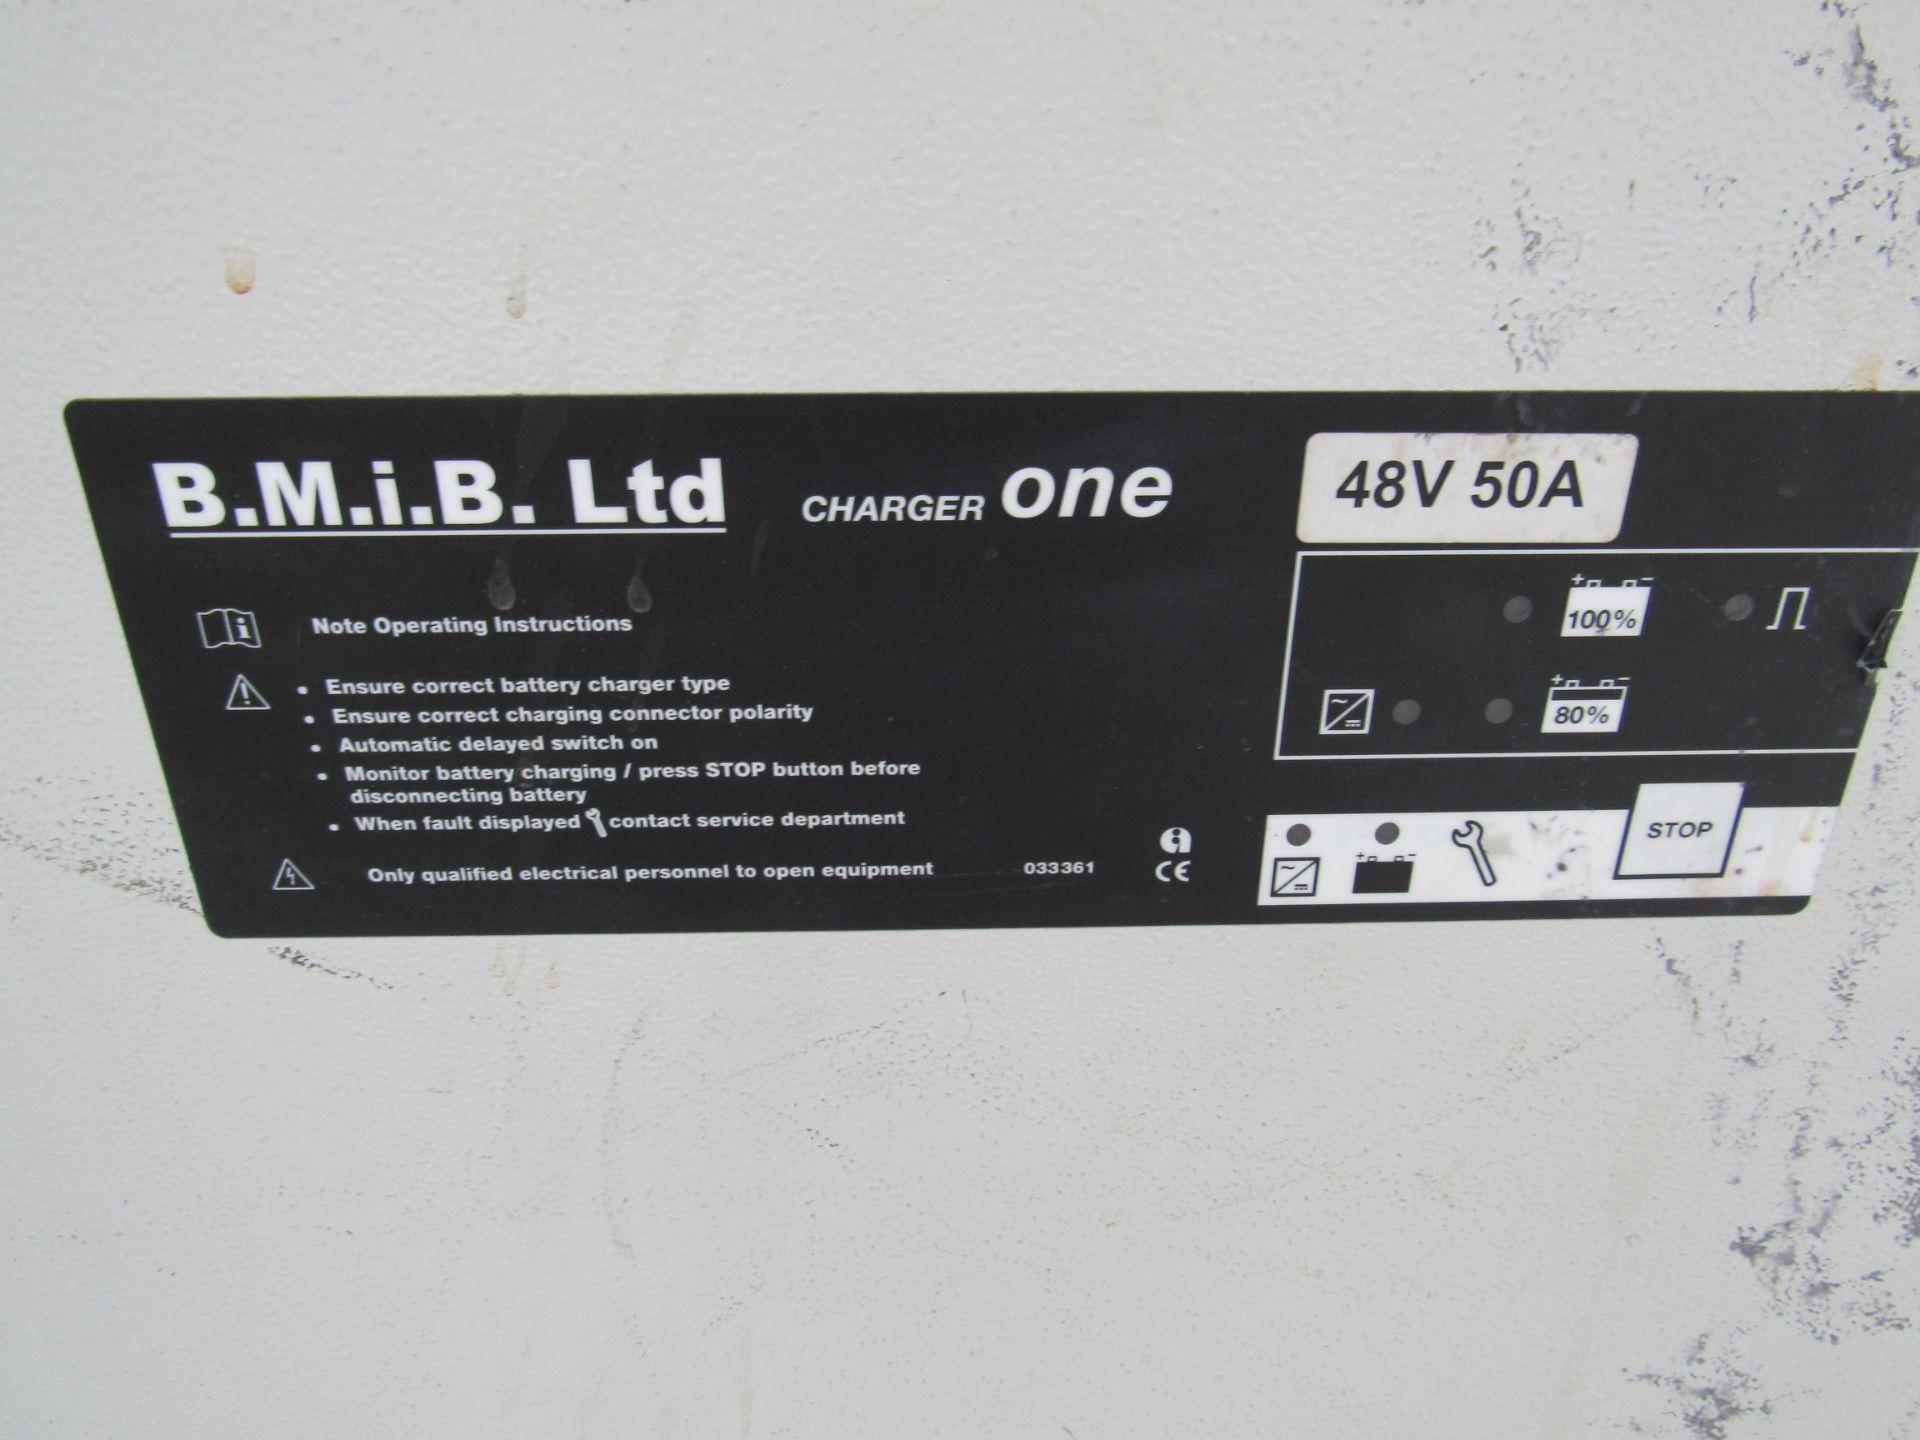 Doosan Daewoo B15T-5 Battery Forklift, 1320kg Capacity, 2278 Hours, Triple Mast, Side Shift, 2007, - Image 20 of 21